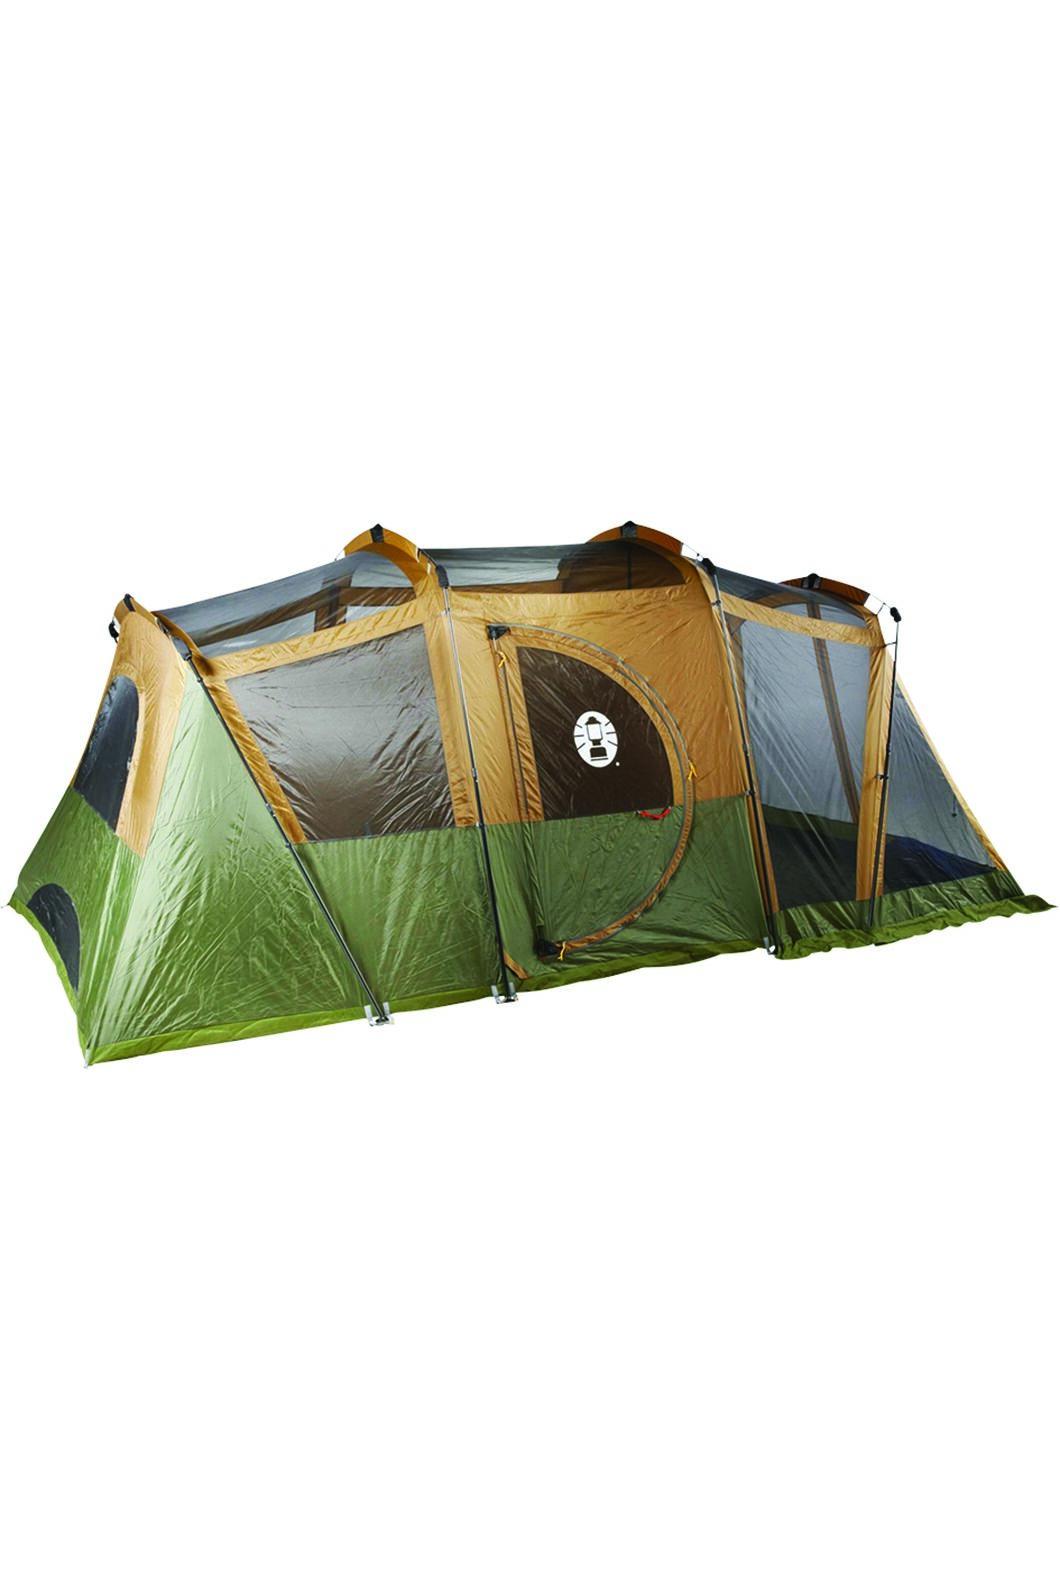 Coleman Cabin Gold Instant Tent 8 Person None hi-res  sc 1 st  Macpac & Coleman Cabin Gold Instant Tent 8 Person